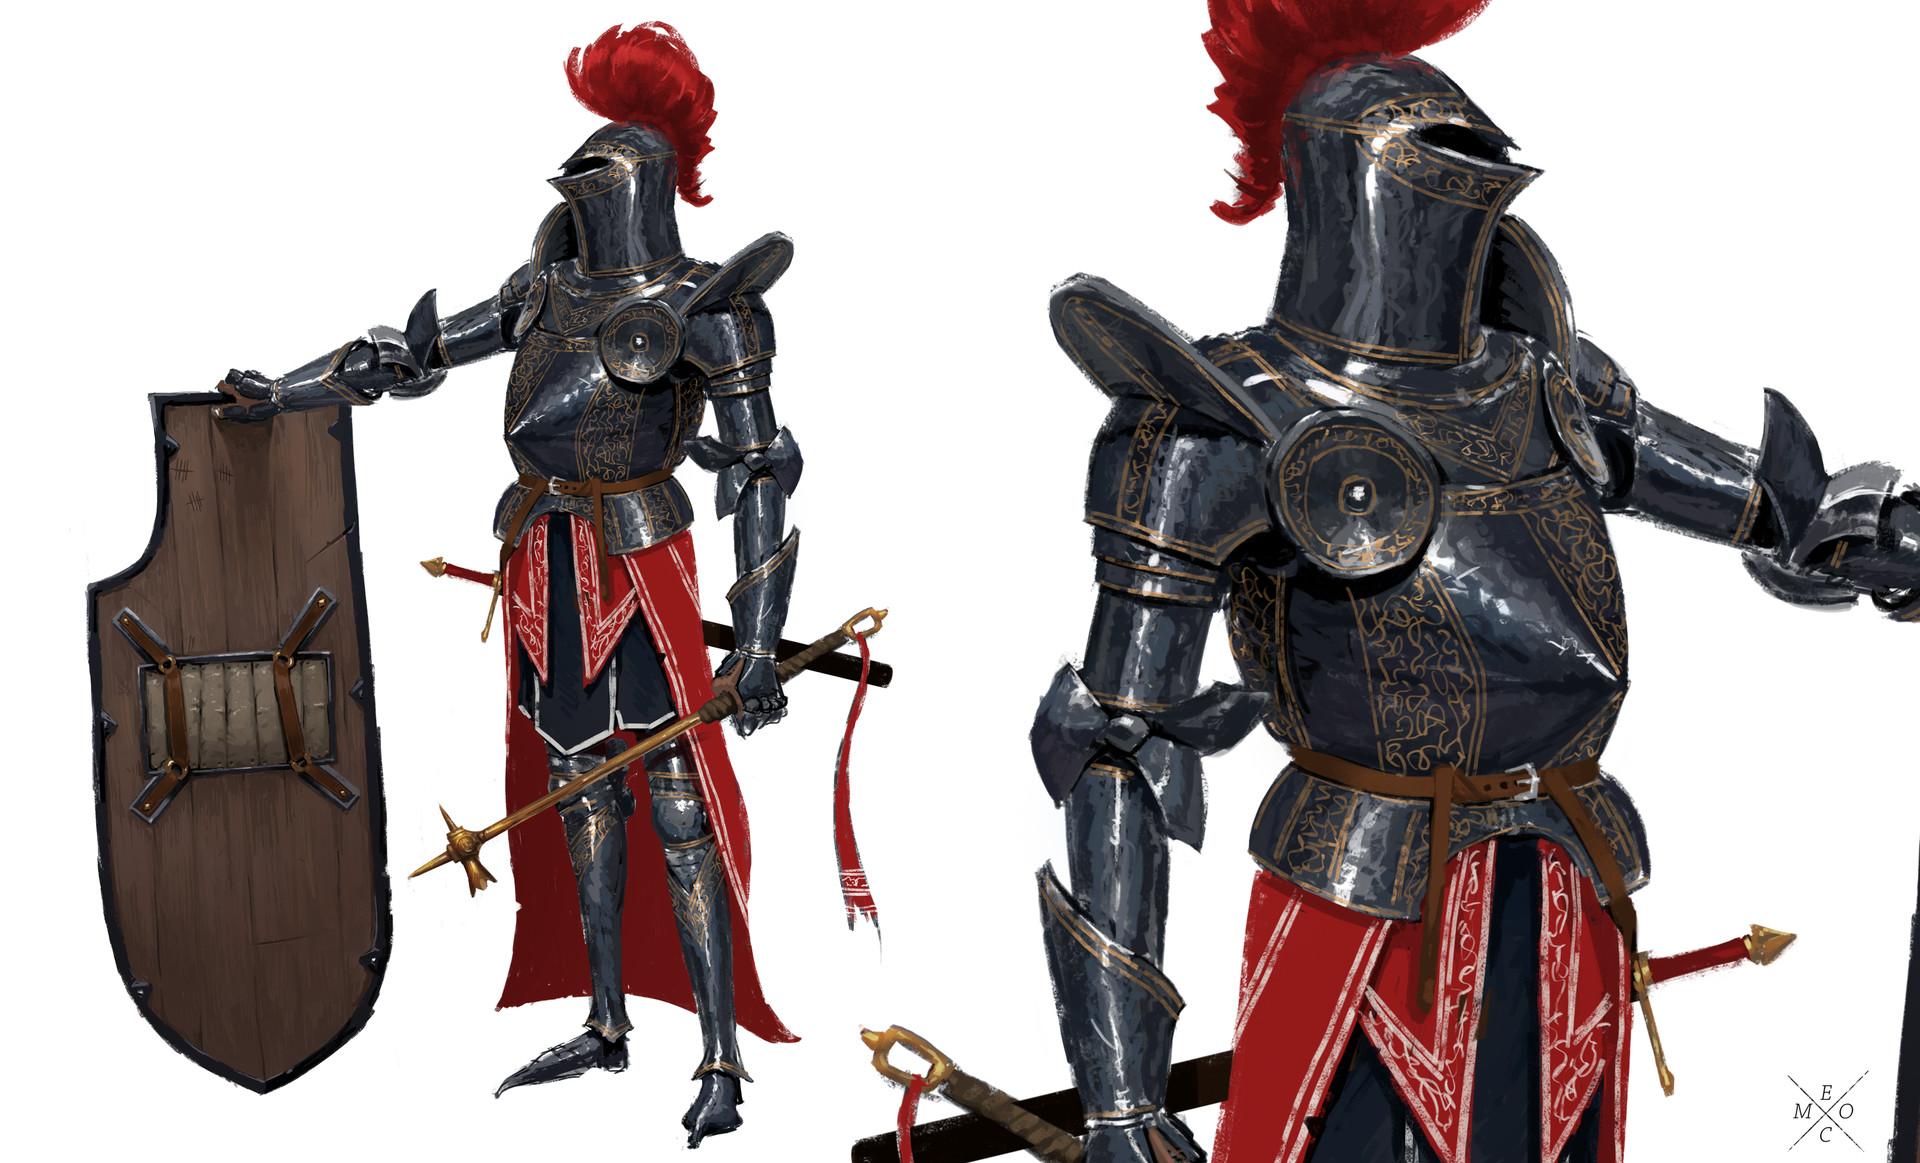 Erlend capodanno shieldy red